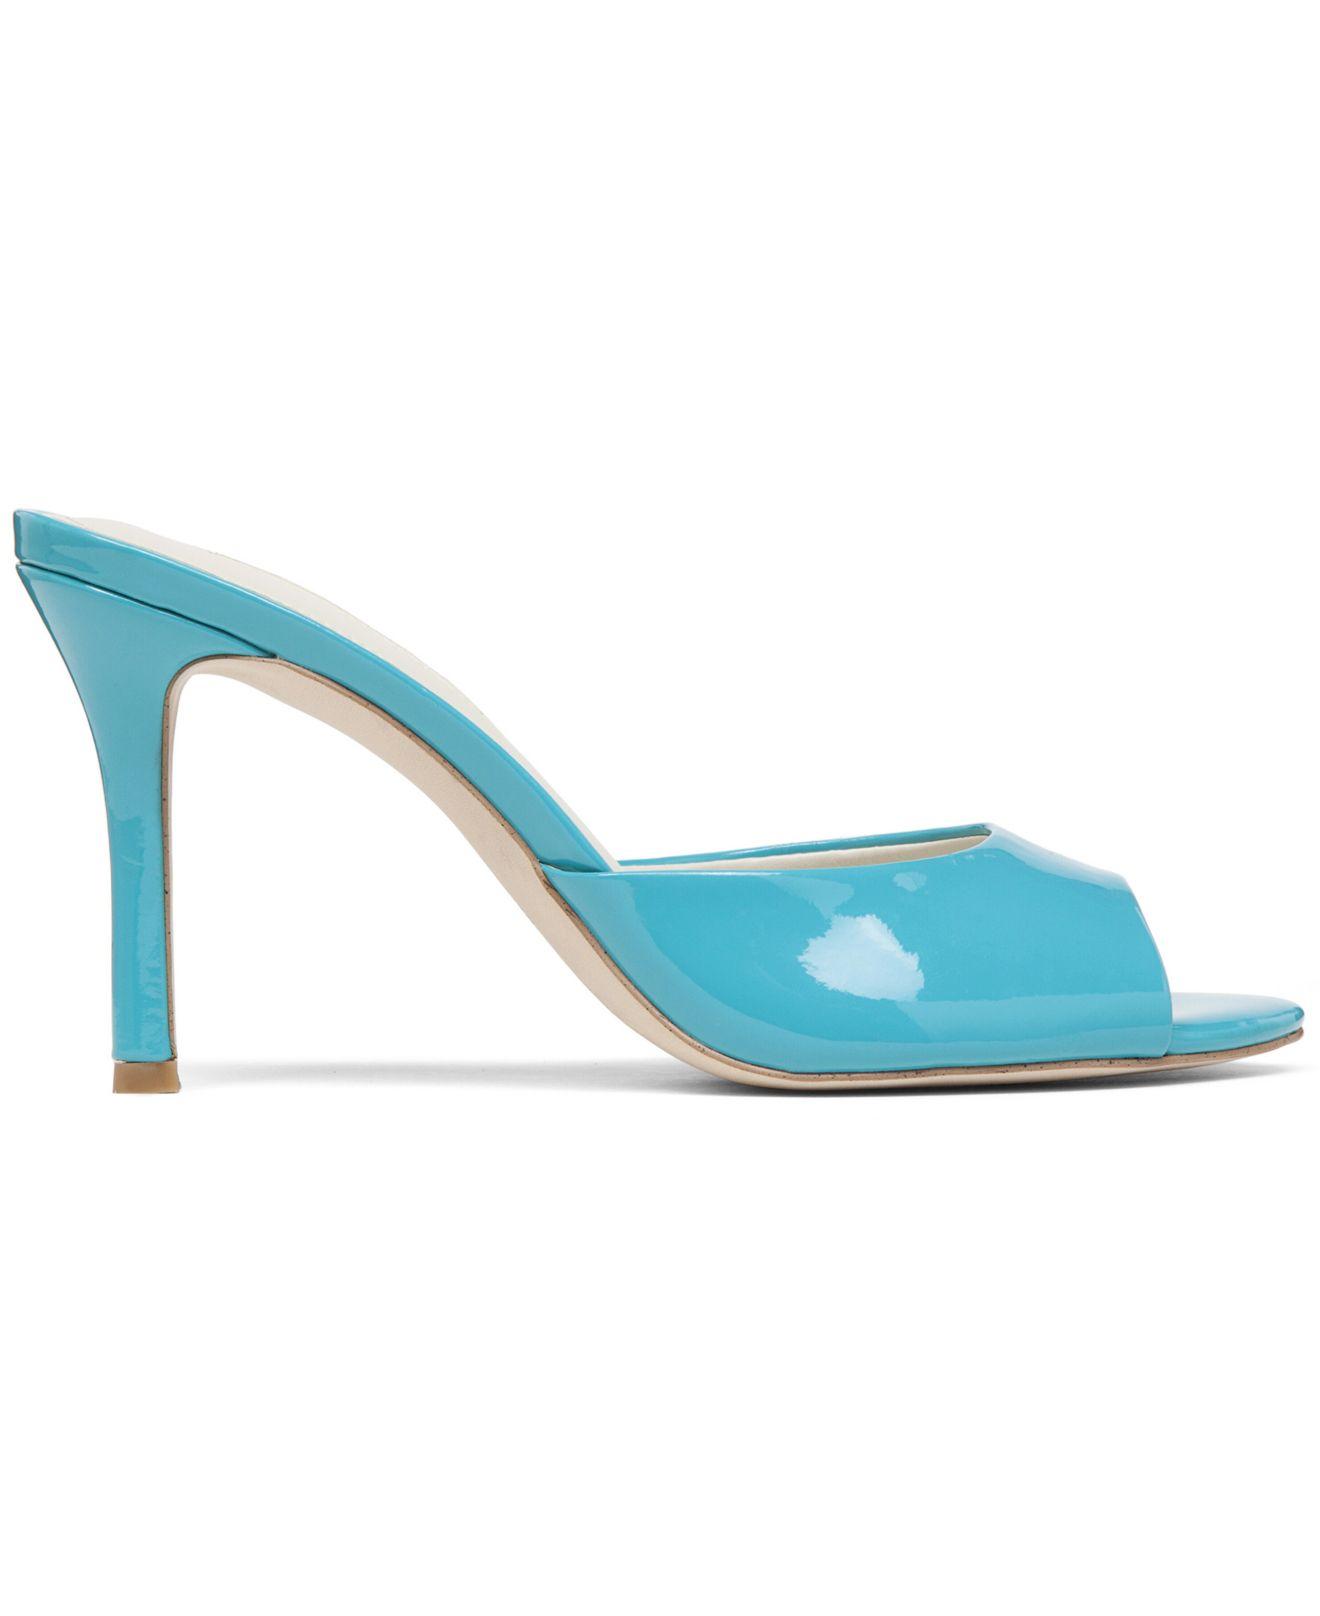 aa63c550861 BCBGeneration Blue Disco Slide Dress Sandals